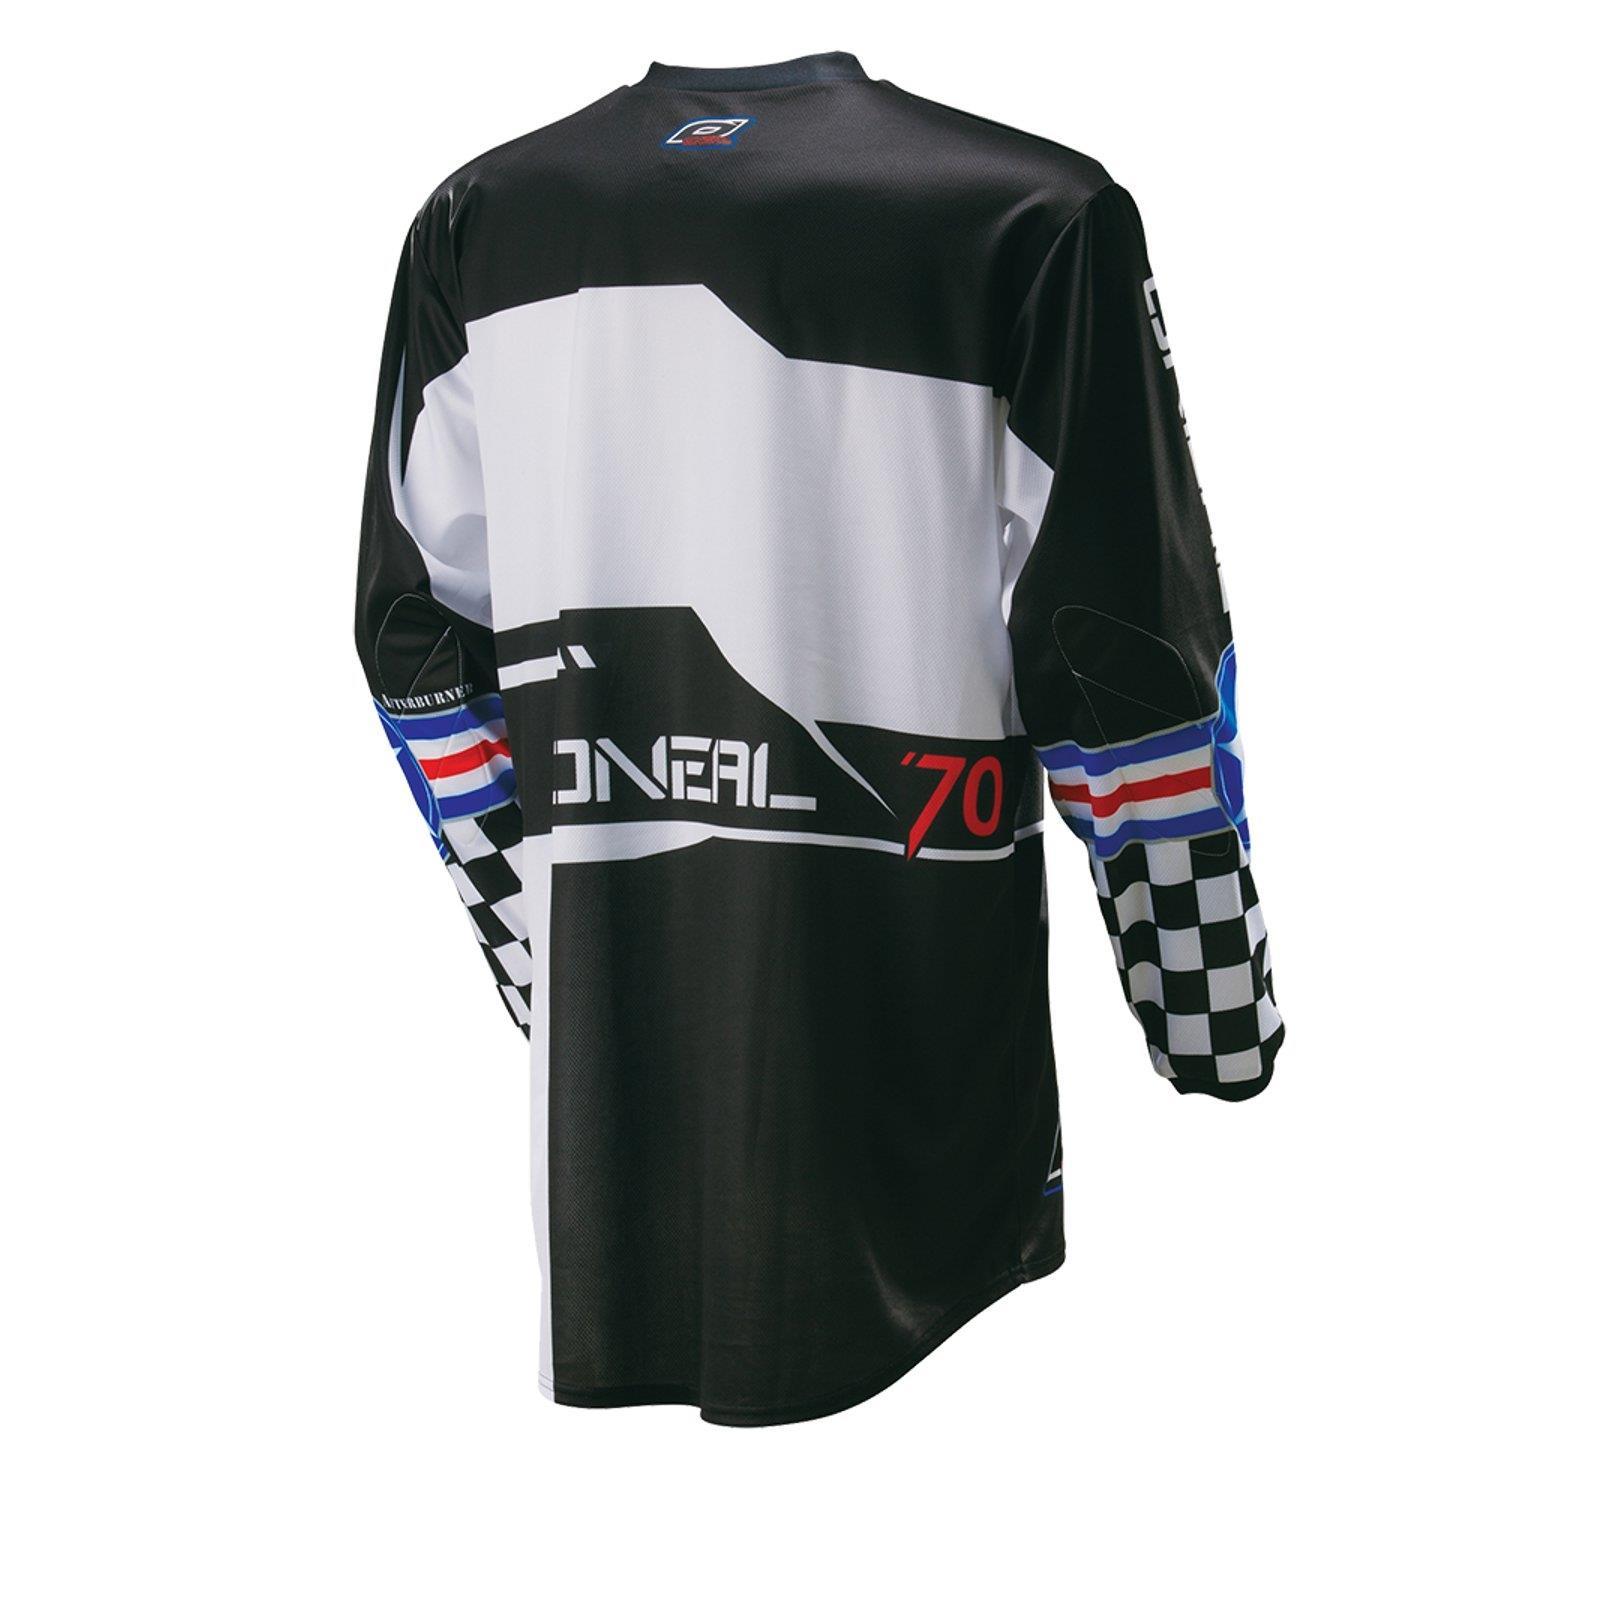 ONeal-pantalones-de-Jersey-de-los-ninos-de-pantalones-cortos-ninos-MX-bicicleta-DH-montana-bicicleta miniatura 46